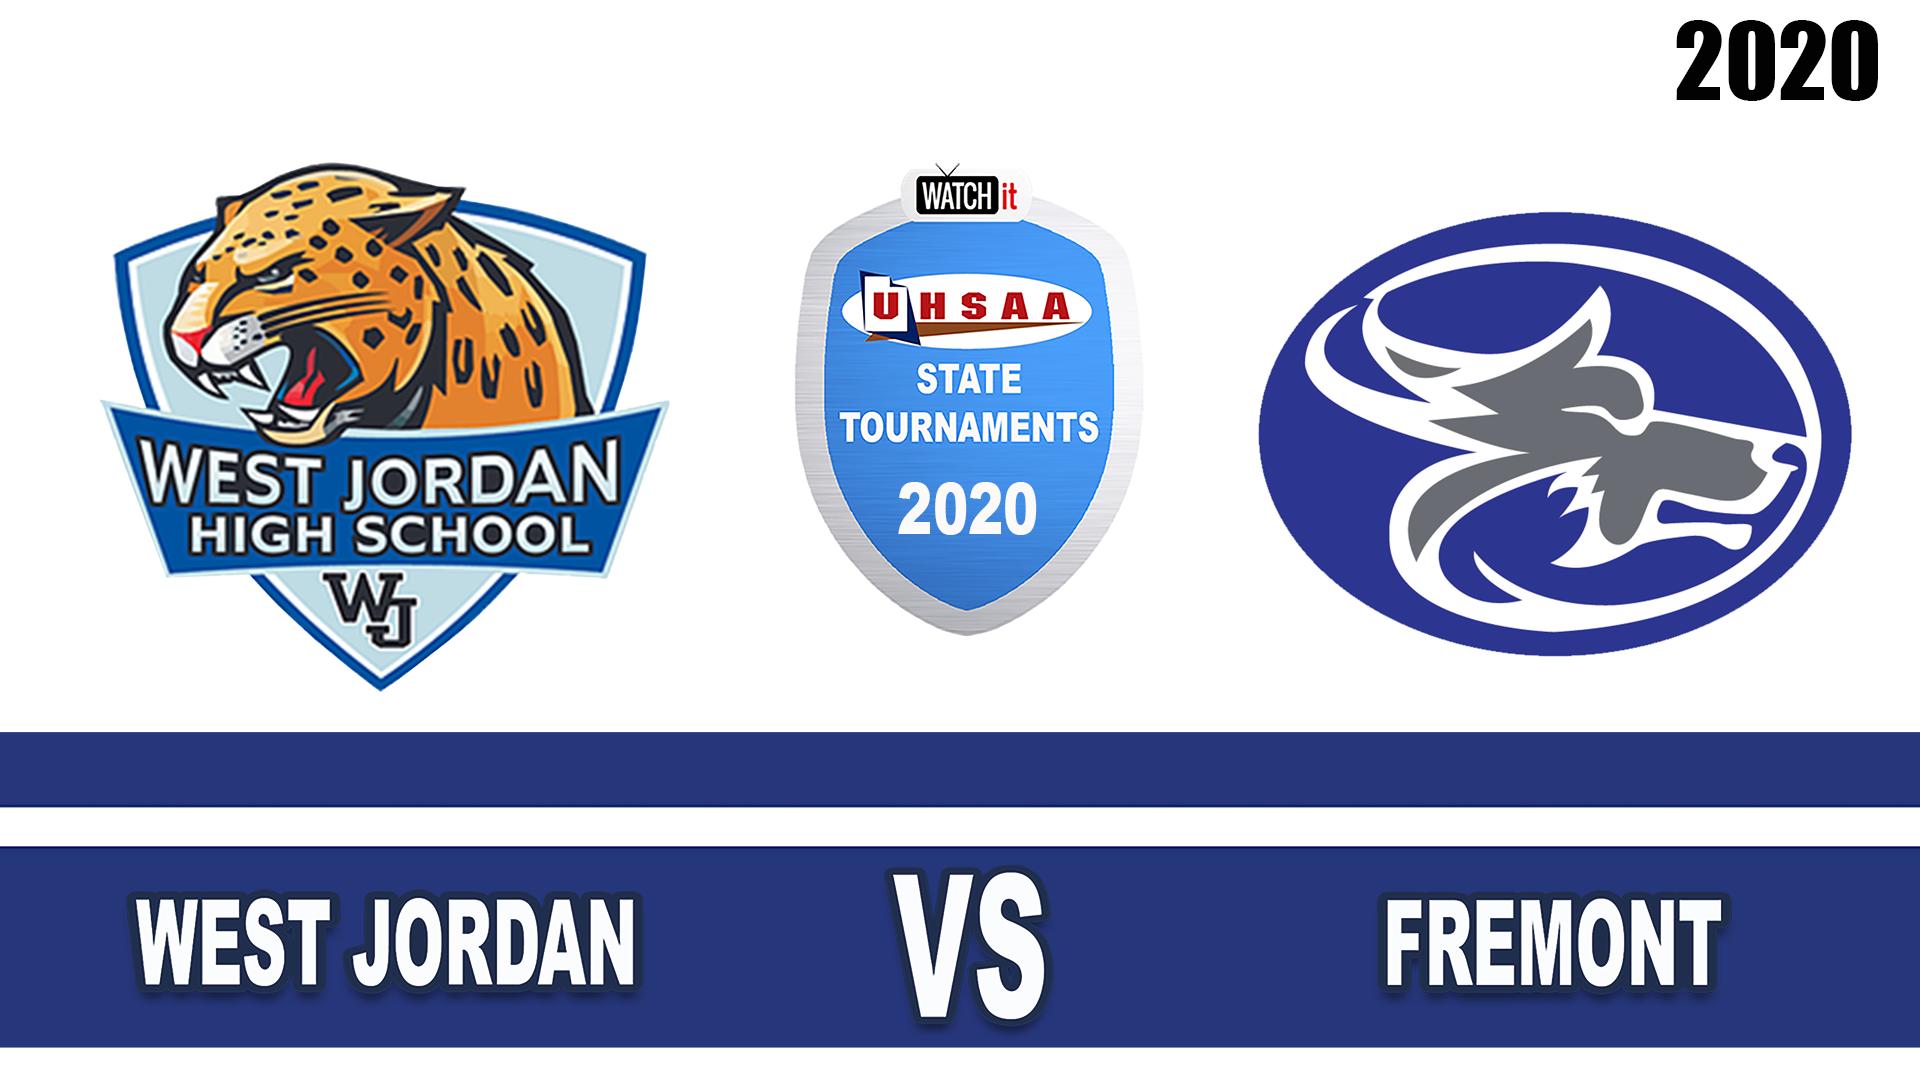 West Jordan vs Fremont